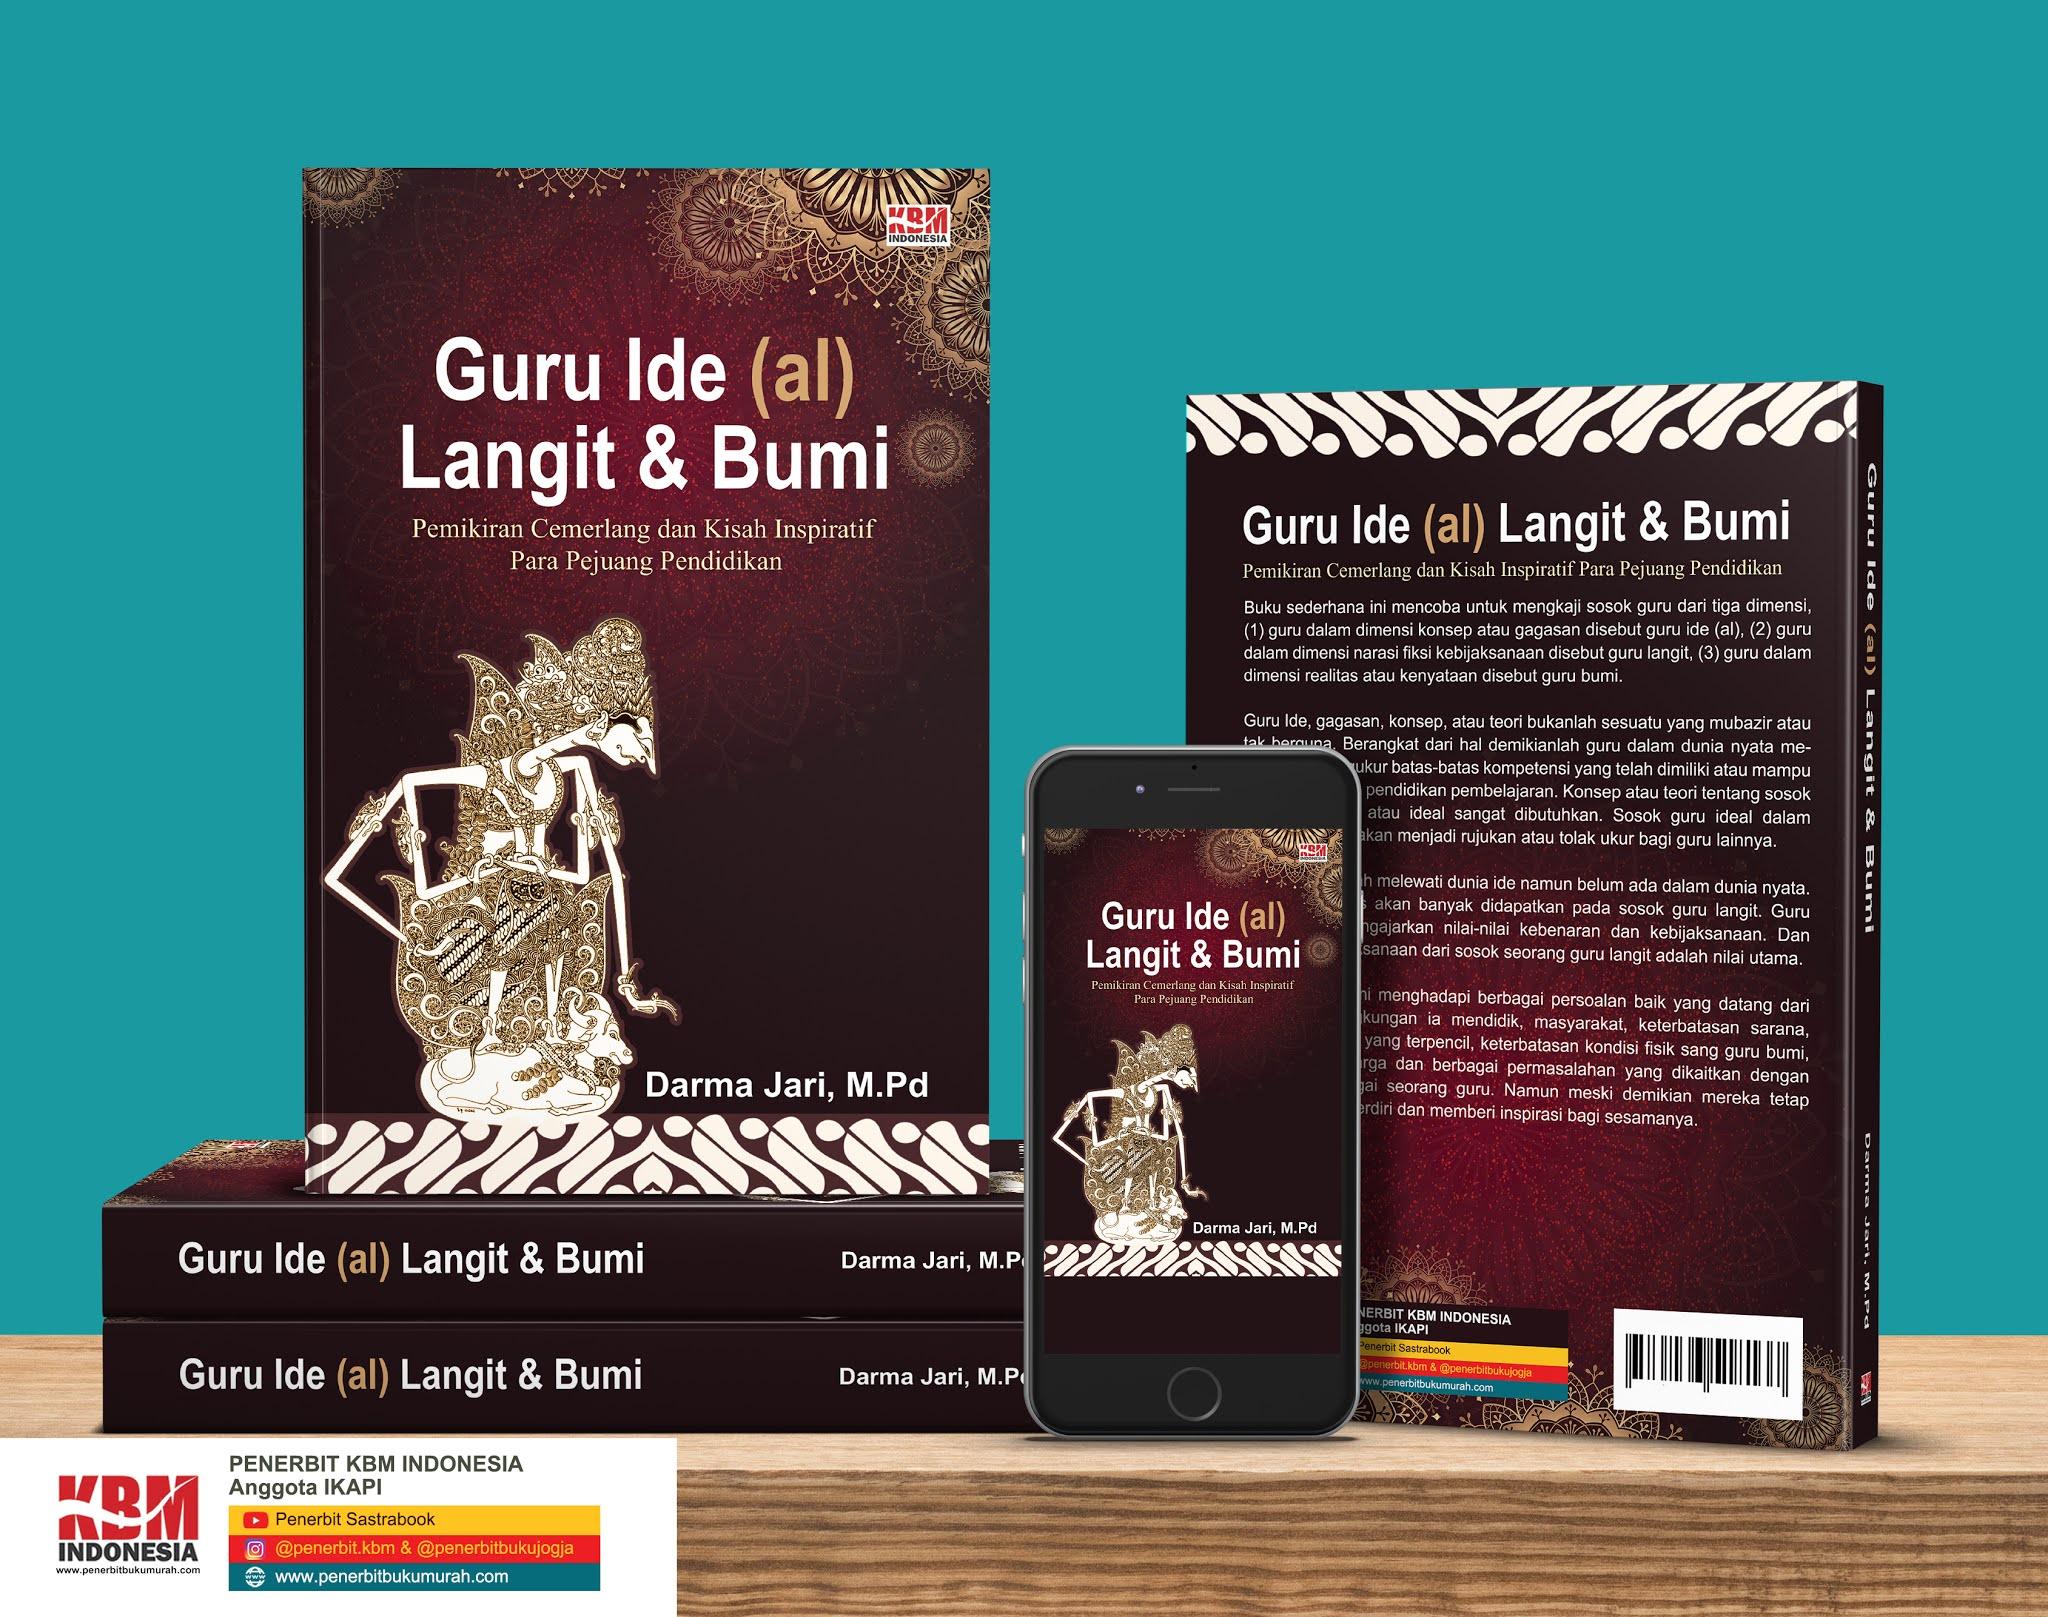 GURU IDE (AL) LANGIT & BUMI